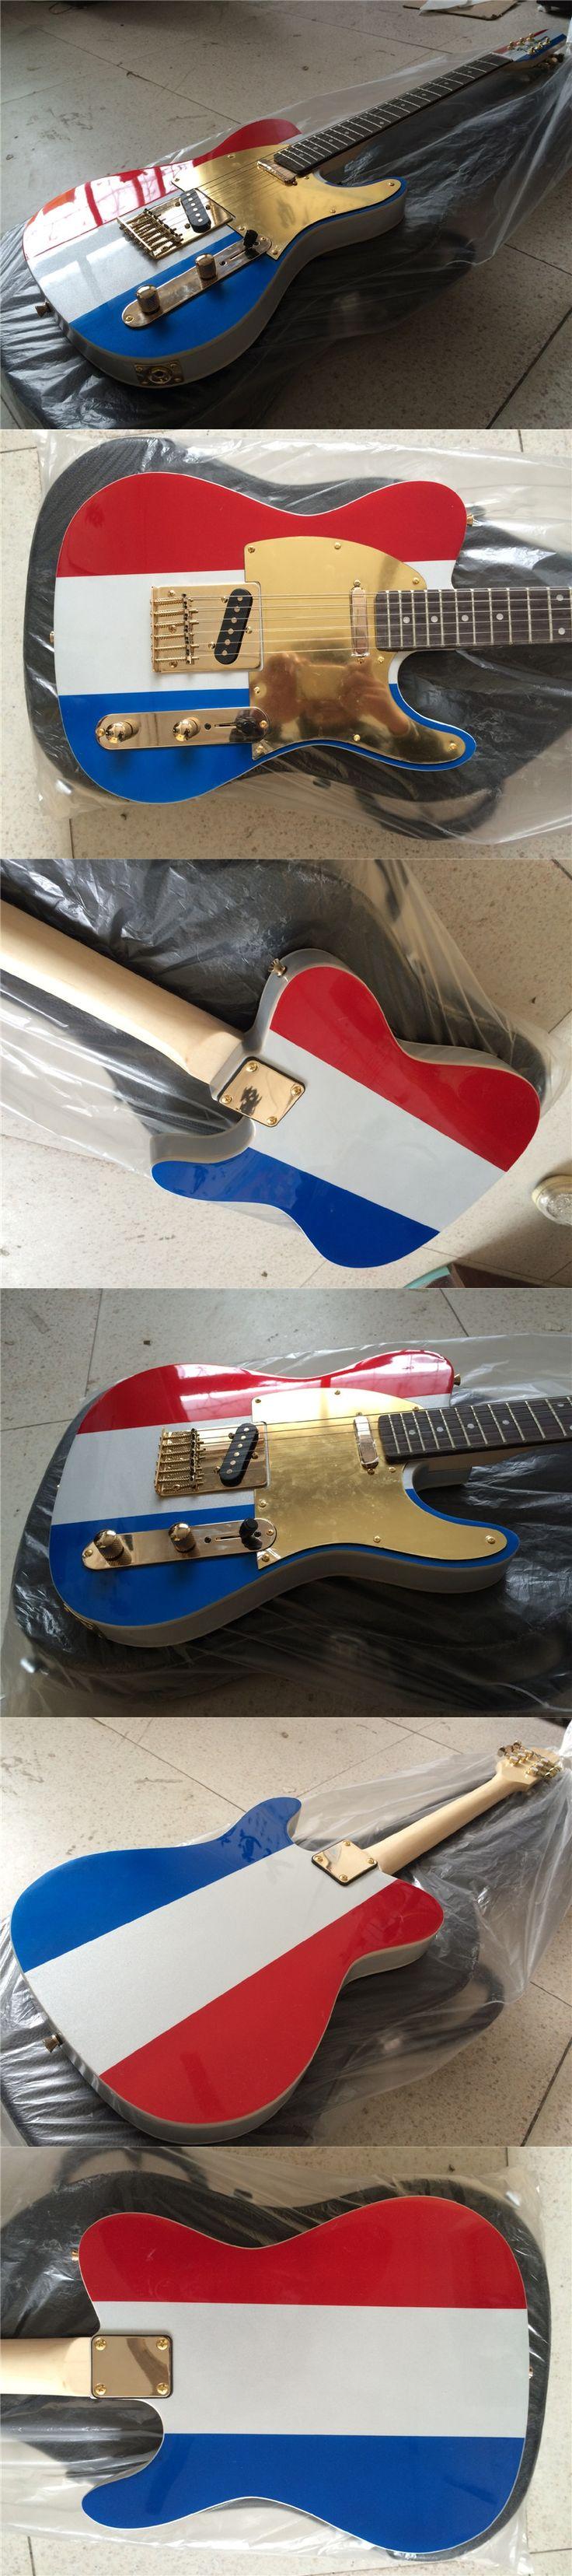 Electric guitar 2016 NEW TL guitar 3 color electric guitar guitar in china